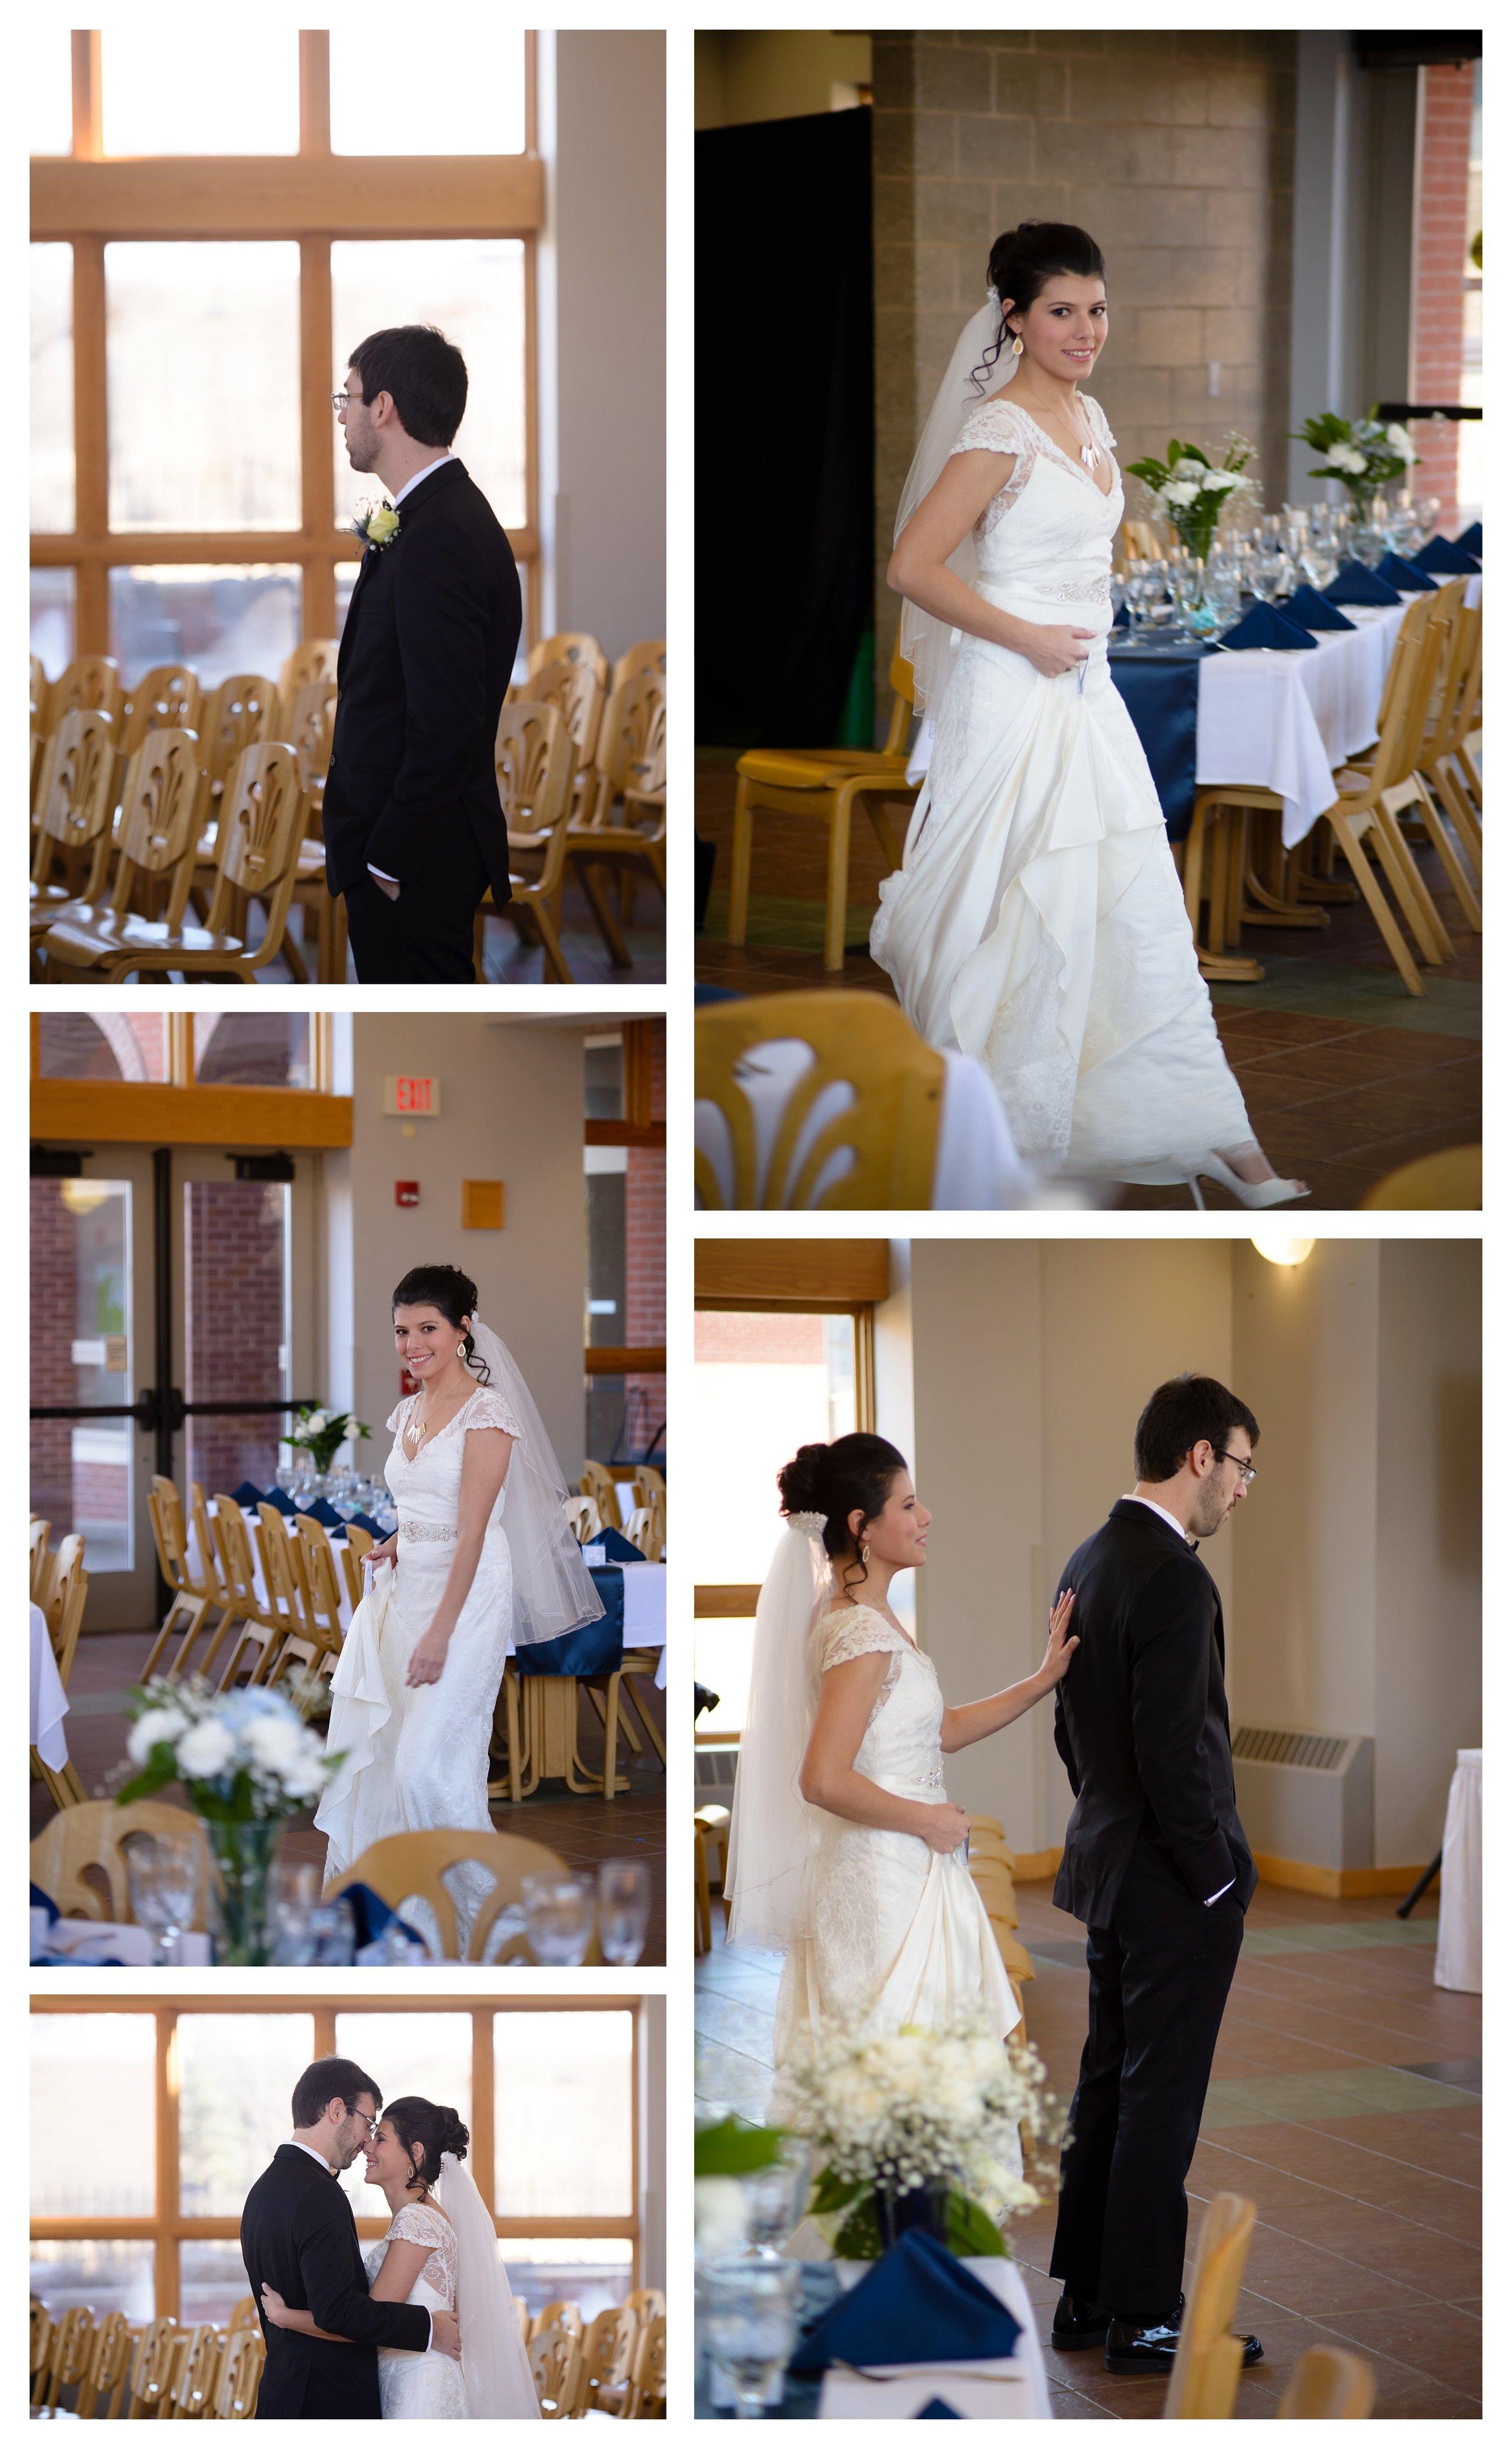 ashland wedding photographer iron river brule wisconsin ps 139 photography jen jensen_0126.jpg